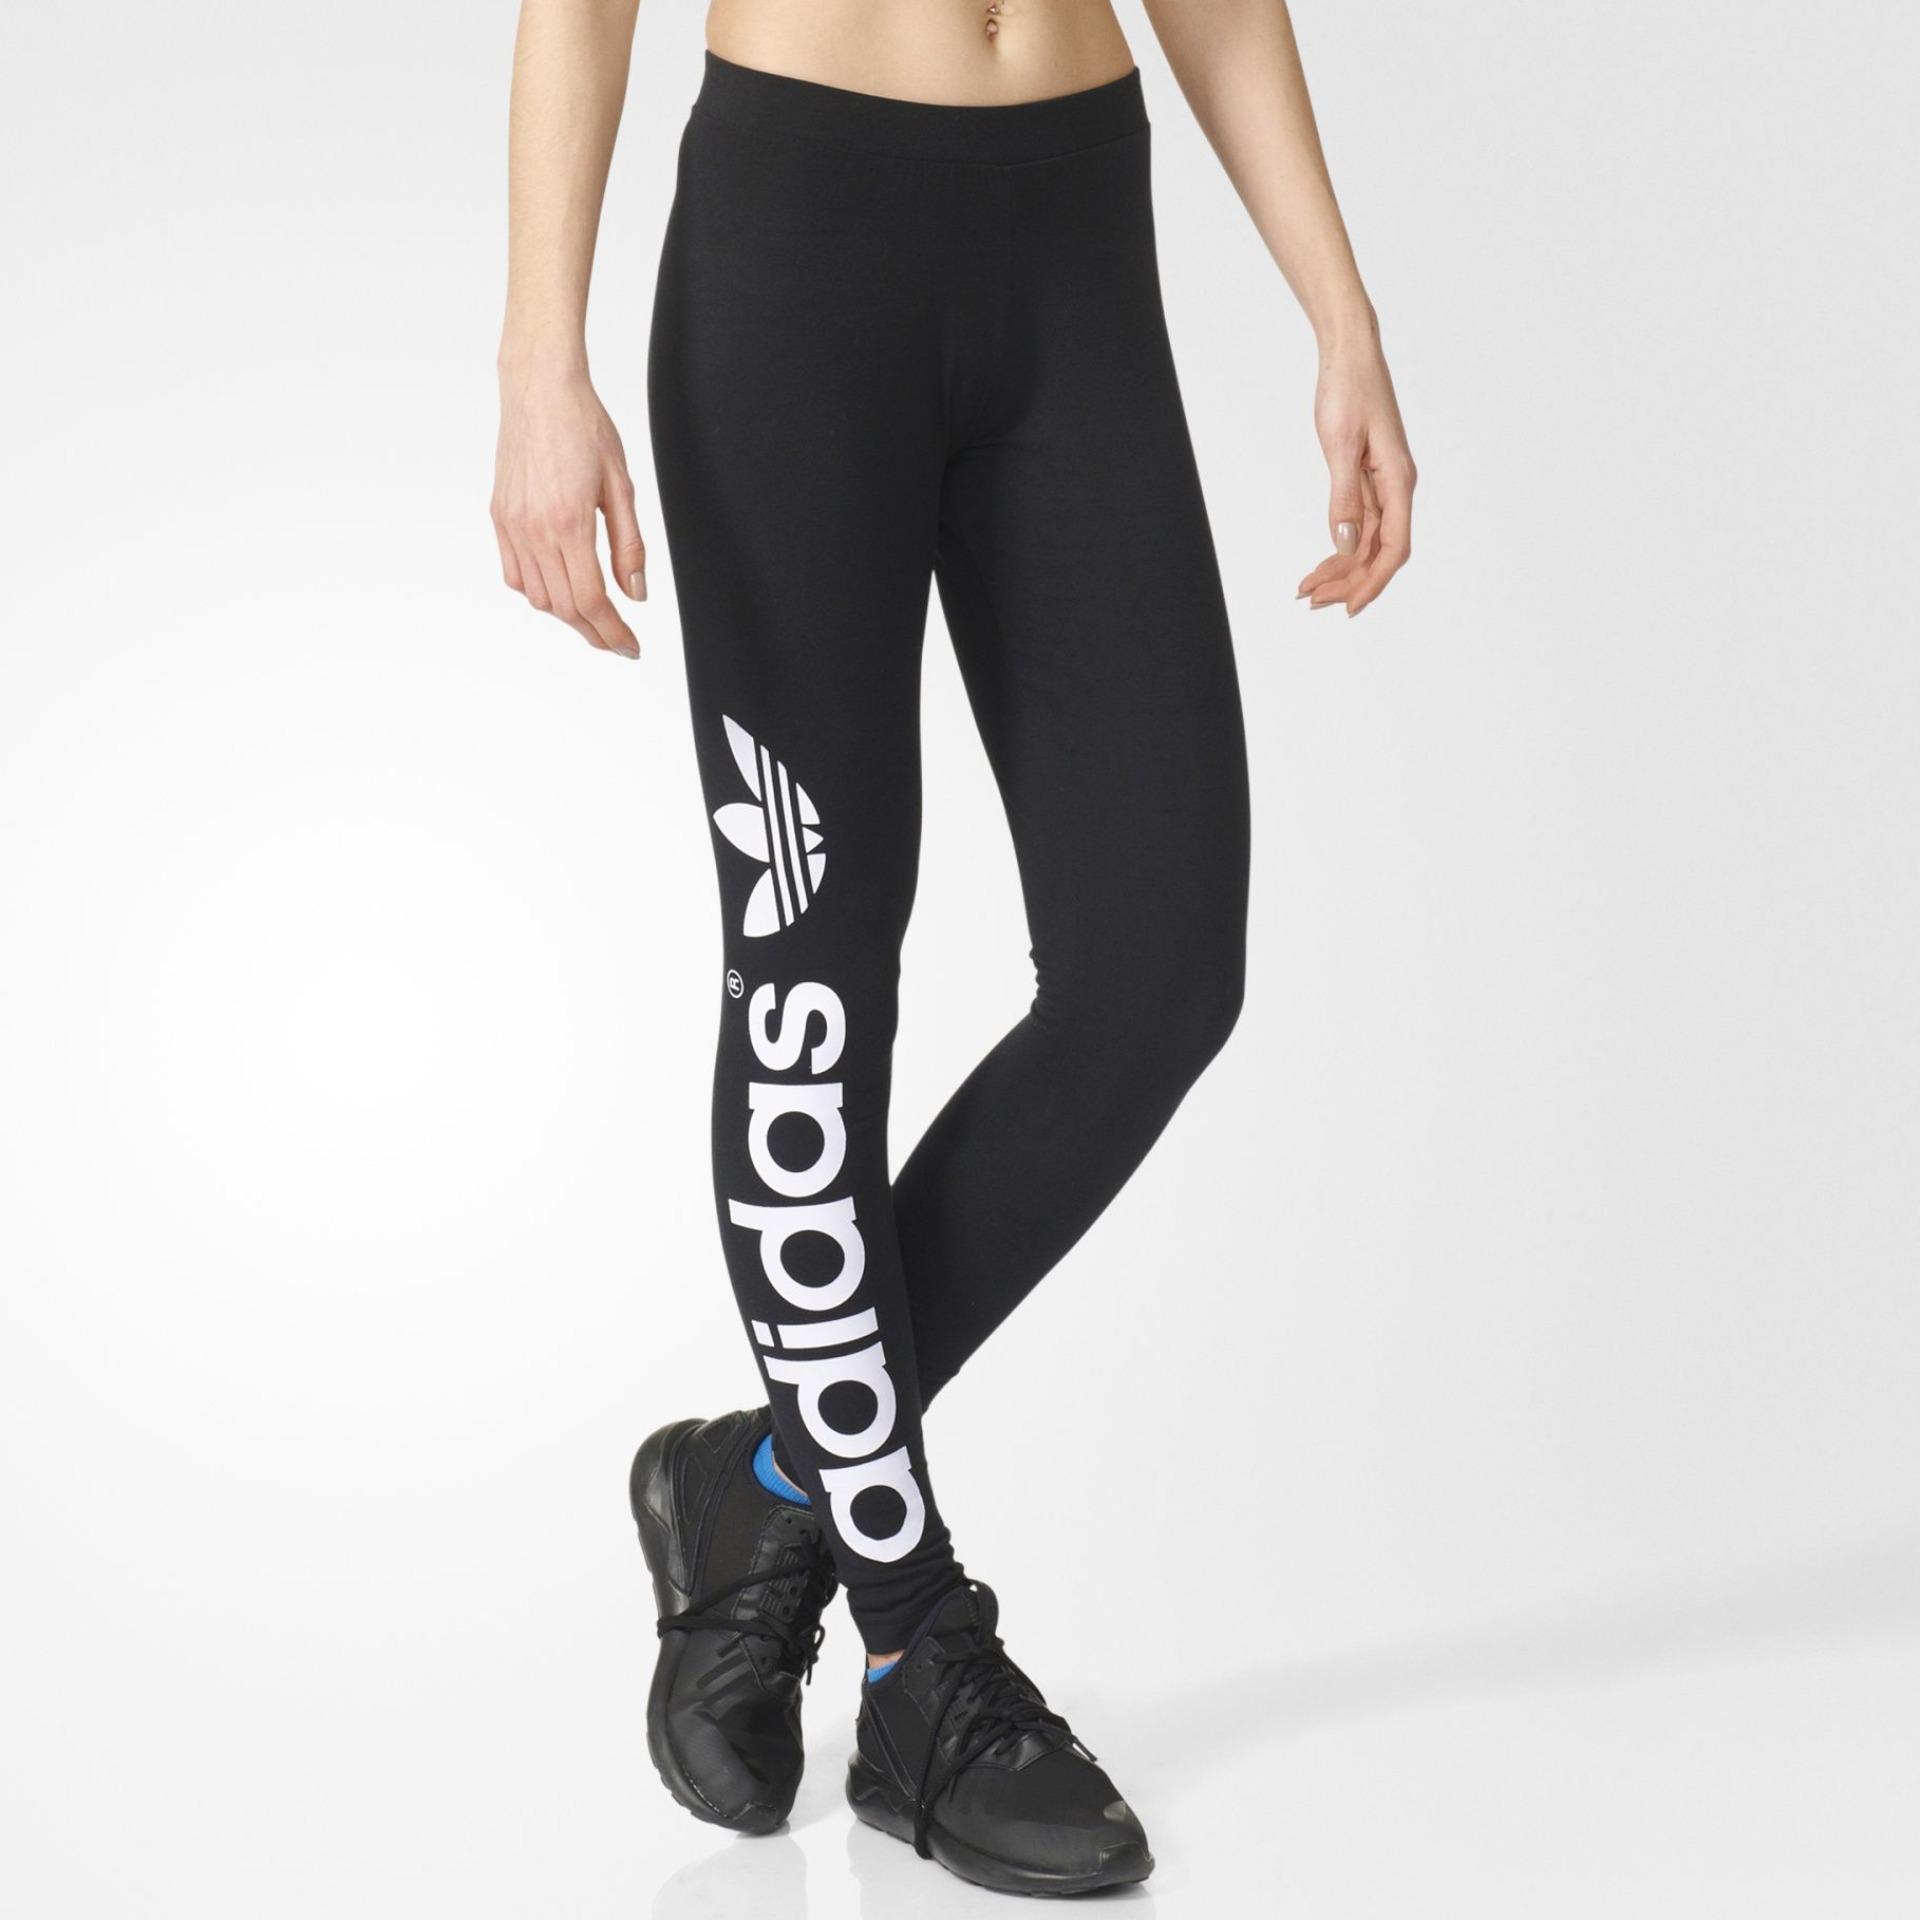 Adidas Celana Legging Linear legging AJ8081 hitam